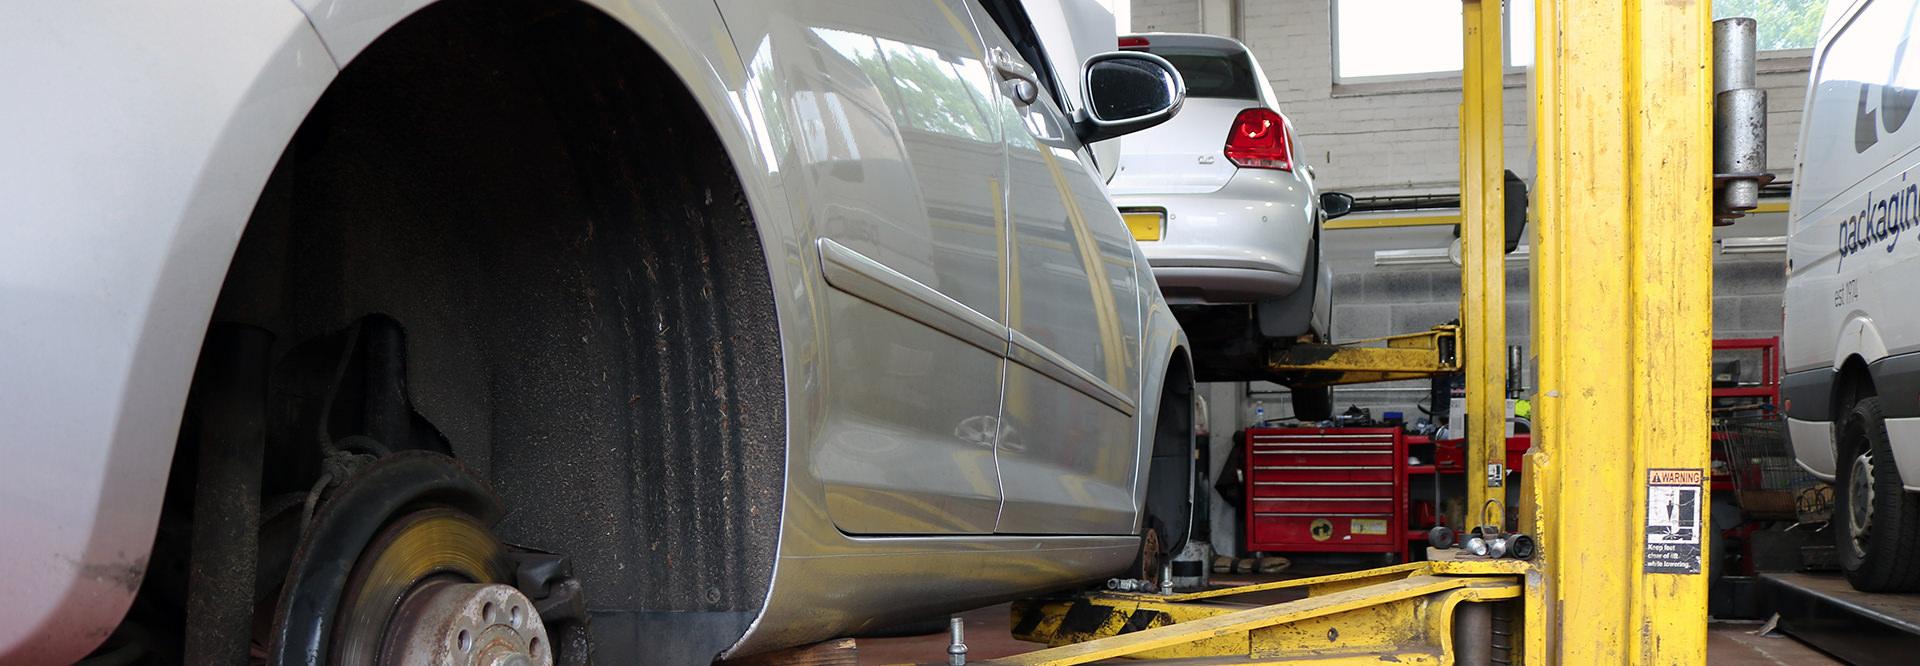 Garage services Leicester